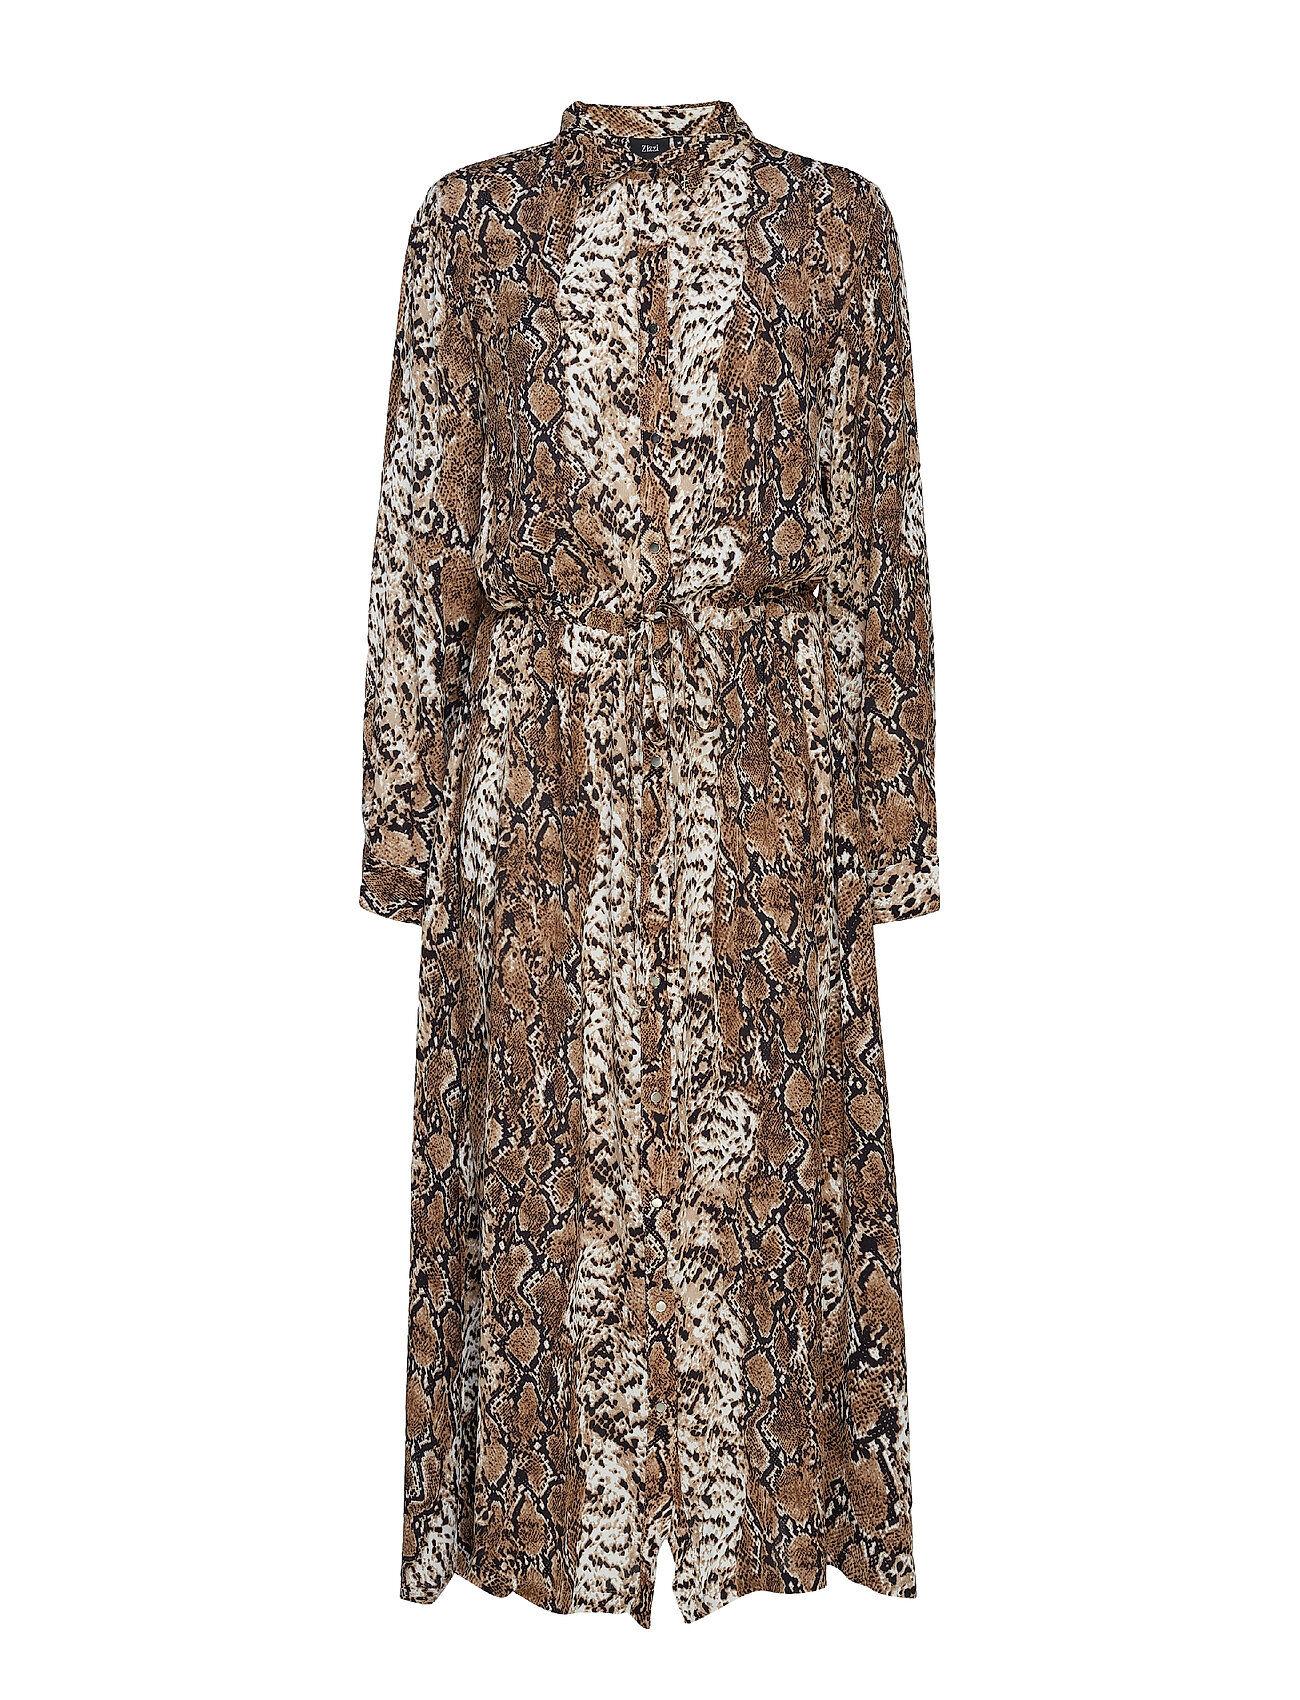 Zizzi Xsnake, Shirt Dress